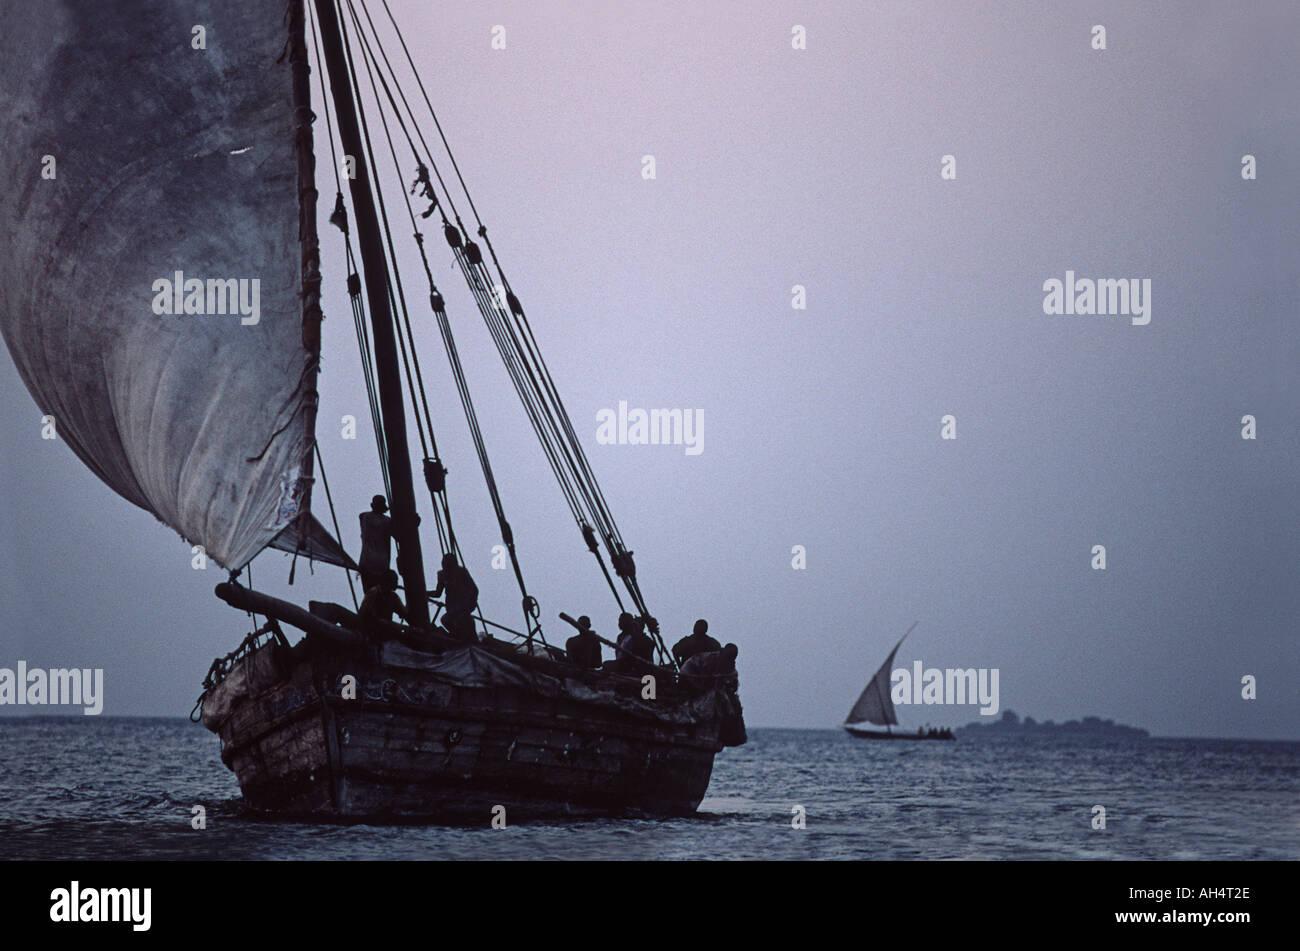 Cargo laden dhow approaching Stone Town at dusk Unguja Zanzibar Tanzania East Africa - Stock Image